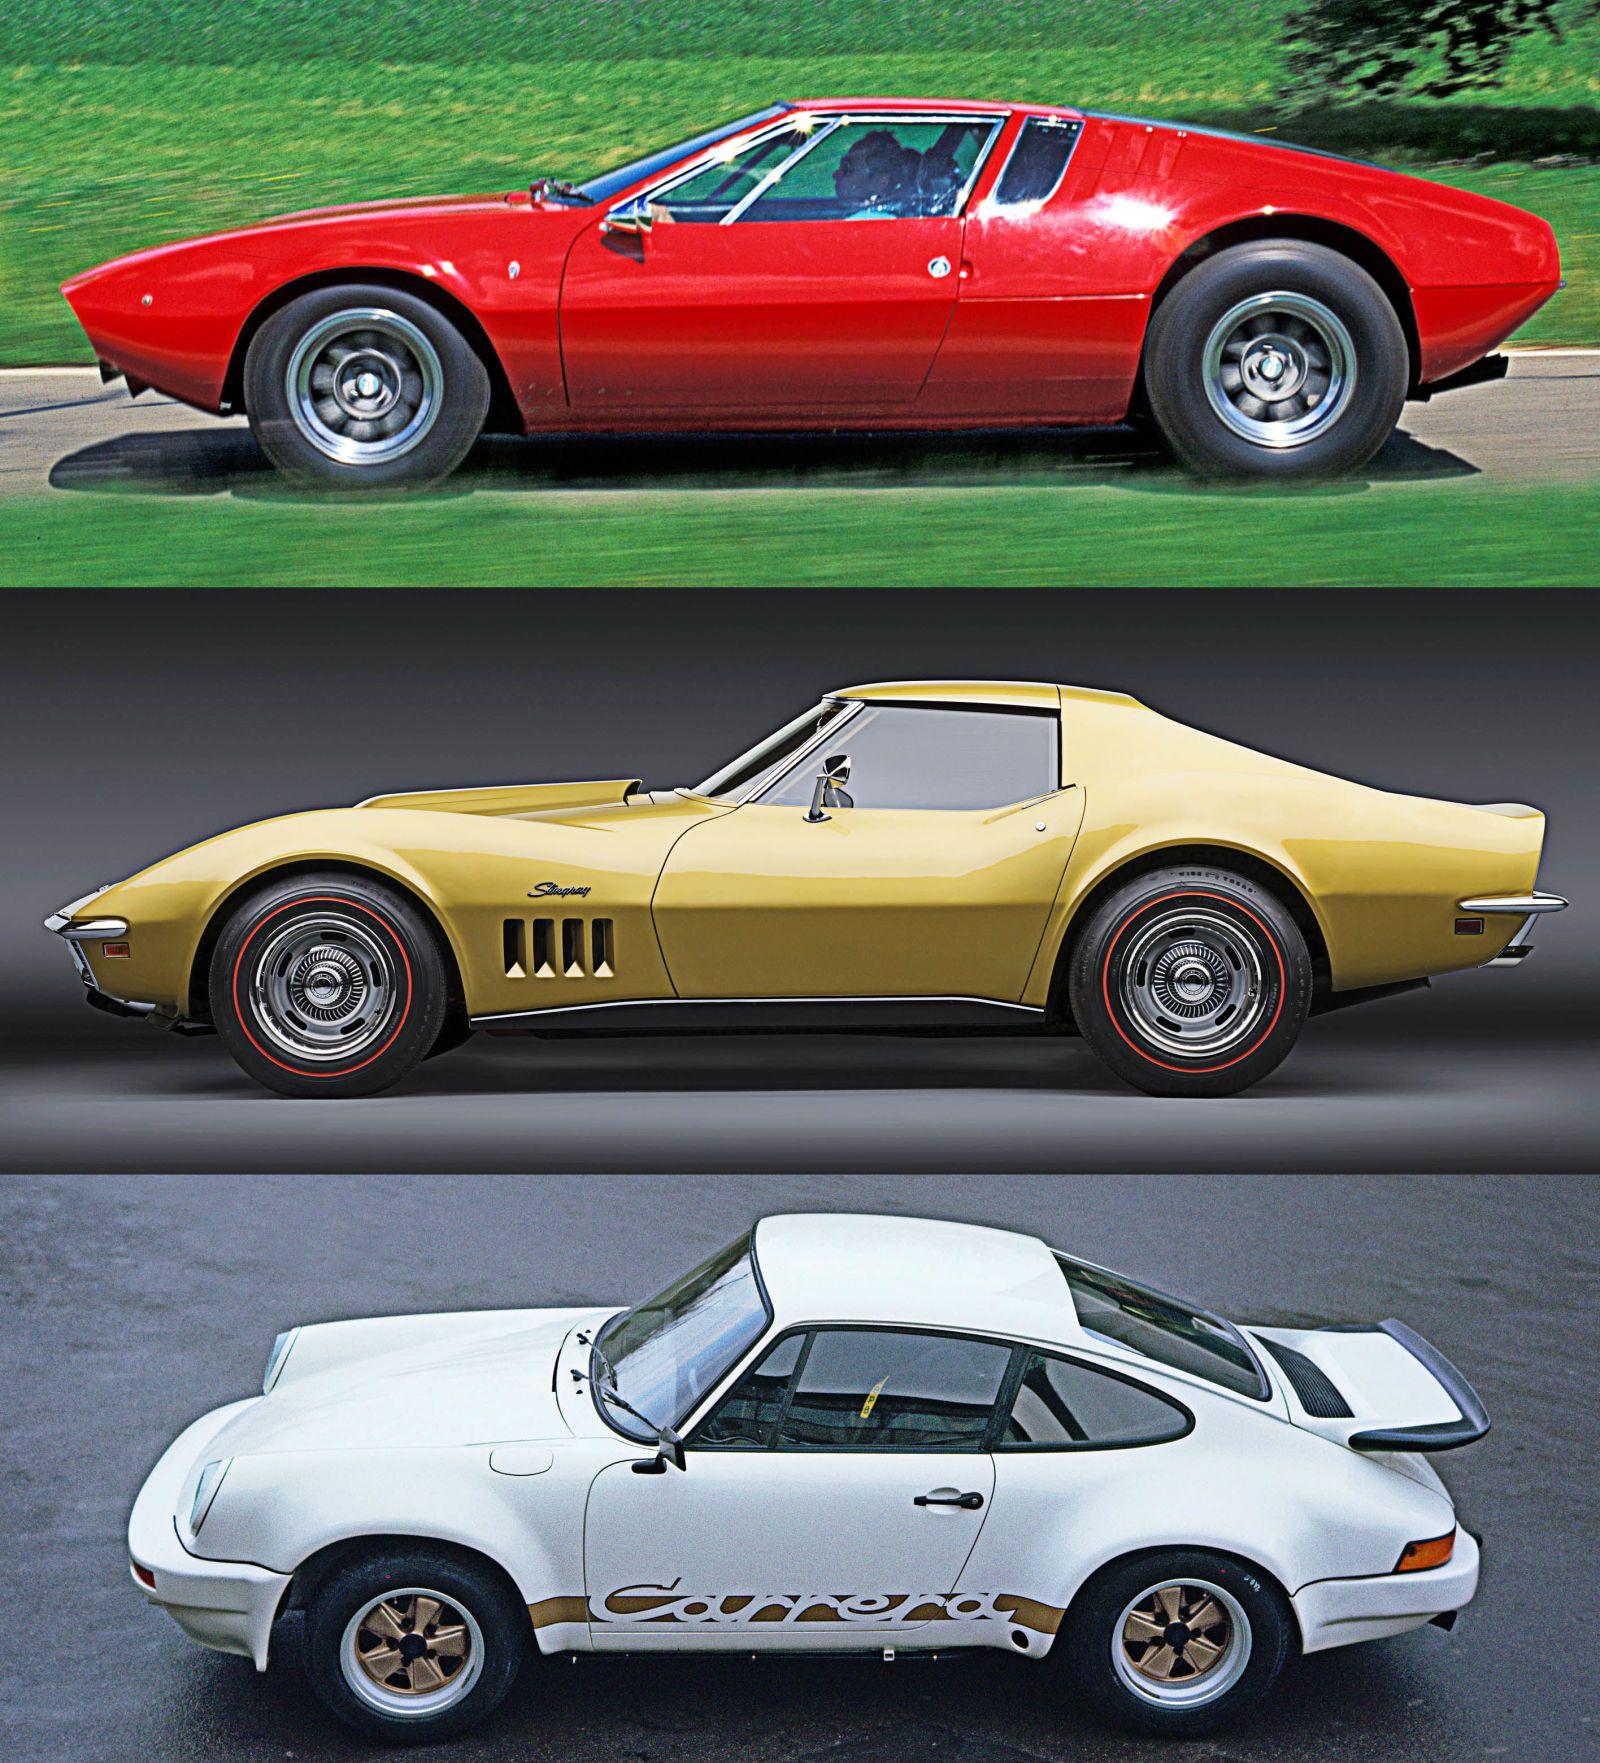 Fast Sports Cars, Chevrolet Corvette